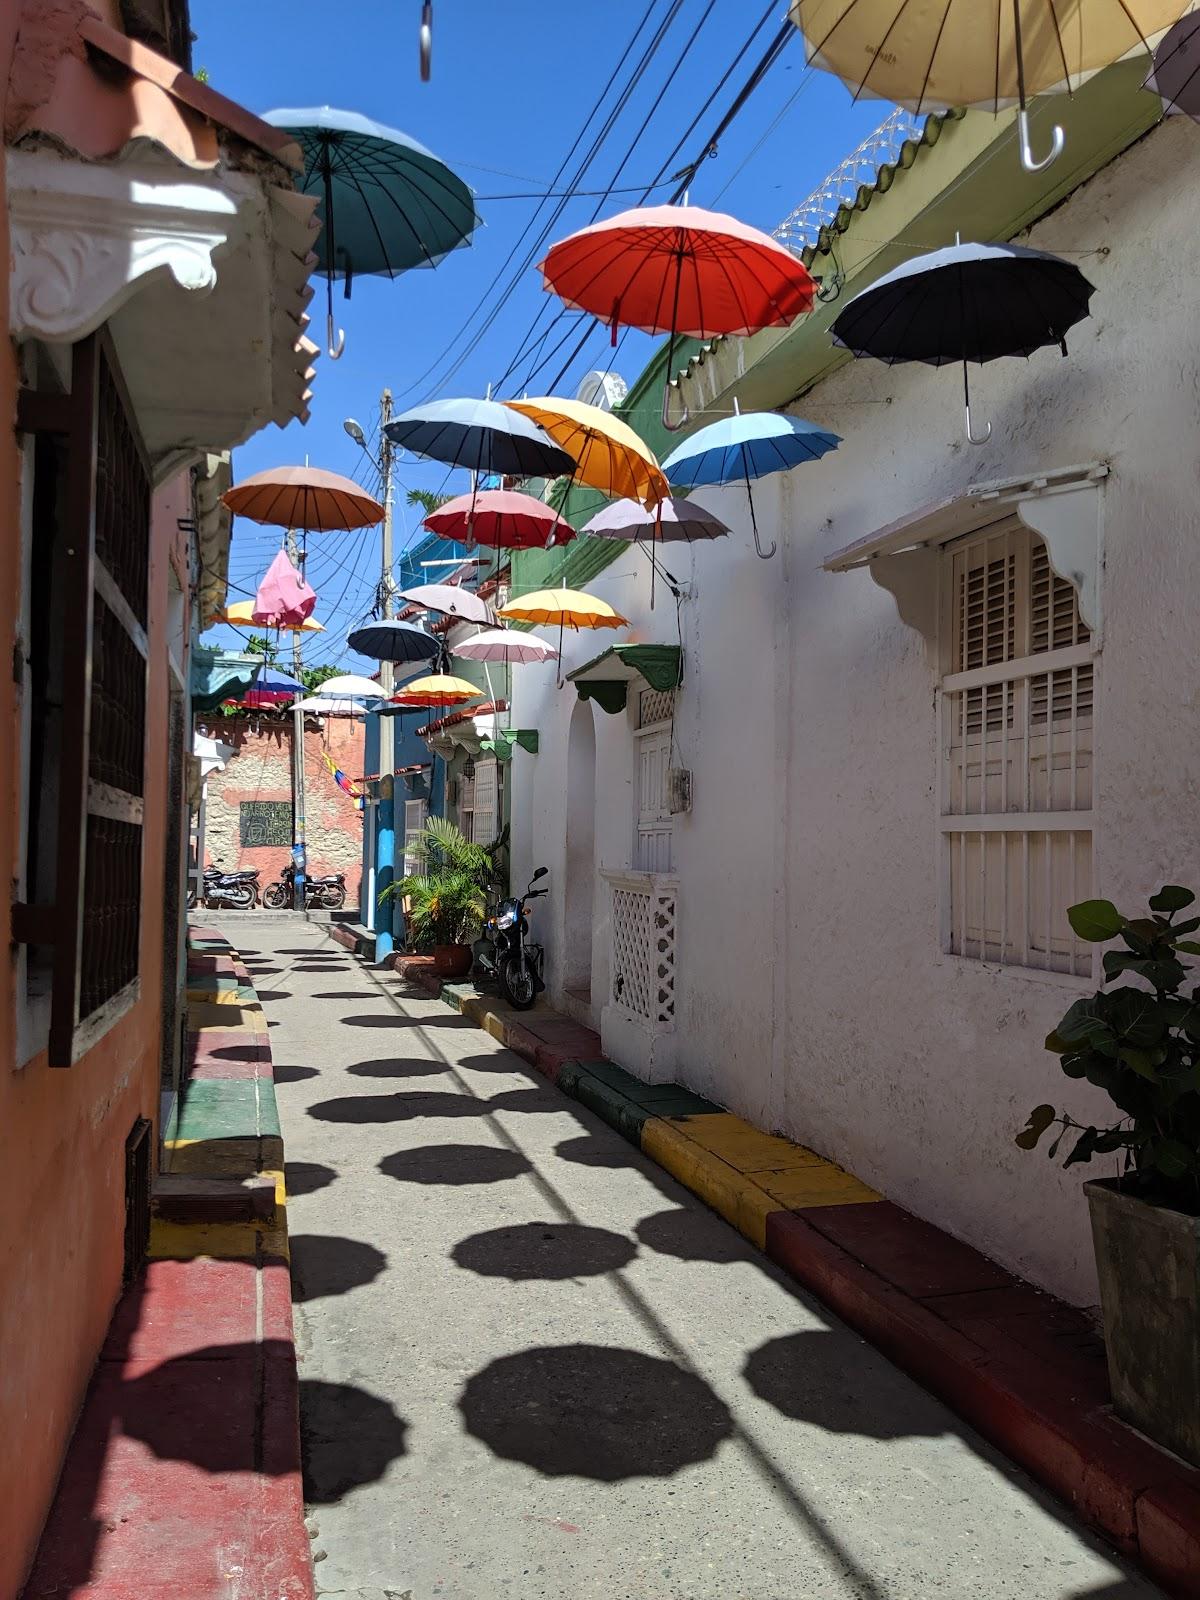 Getsmani Cartagena, Colombia.